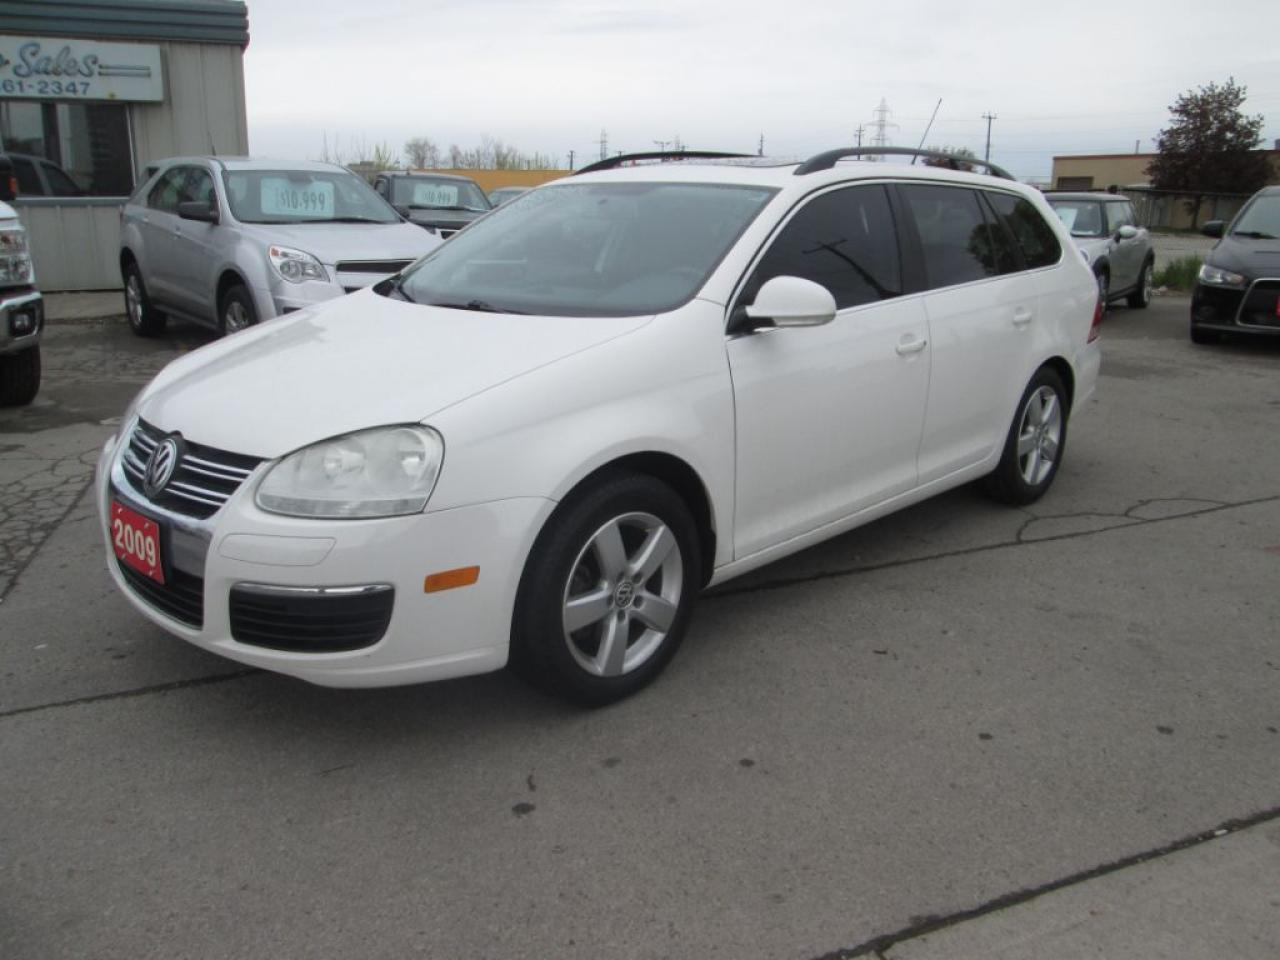 Photo of White 2009 Volkswagen Jetta Wagon S